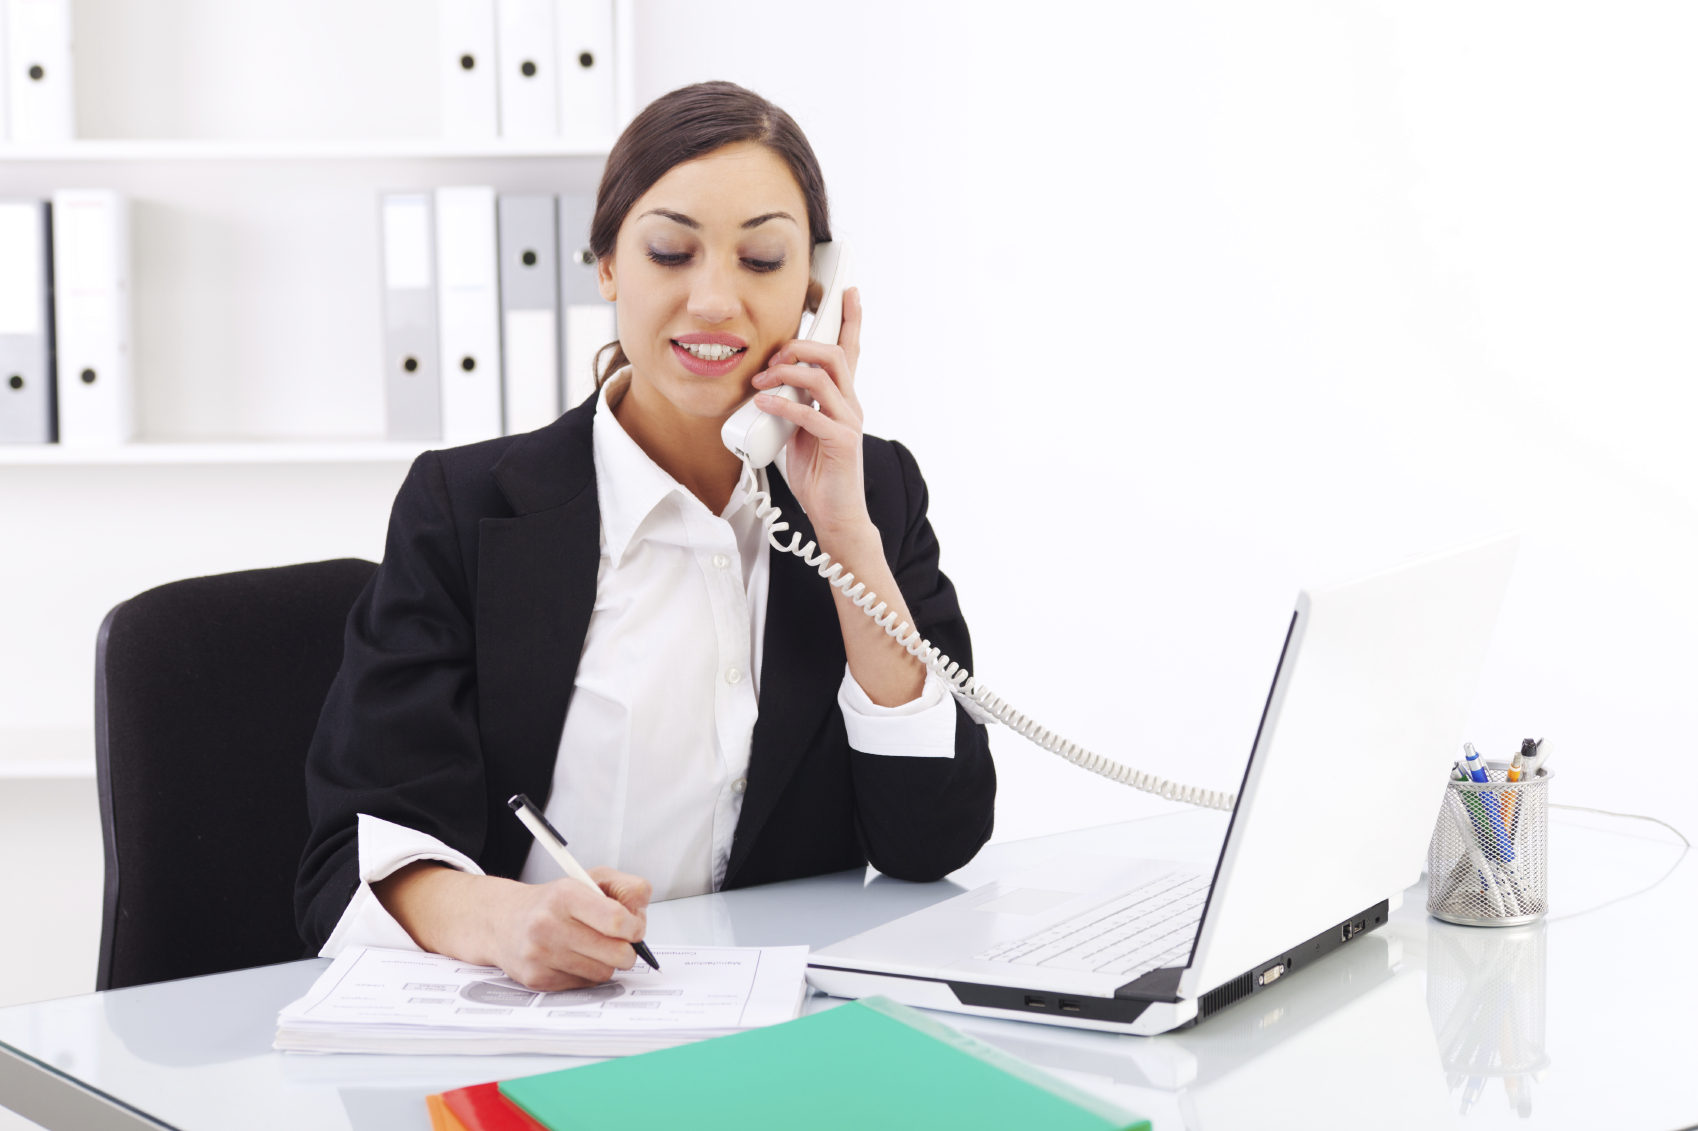 via mashable techniques for acing a phone interview tal group via mashable 3 techniques for acing a phone interview